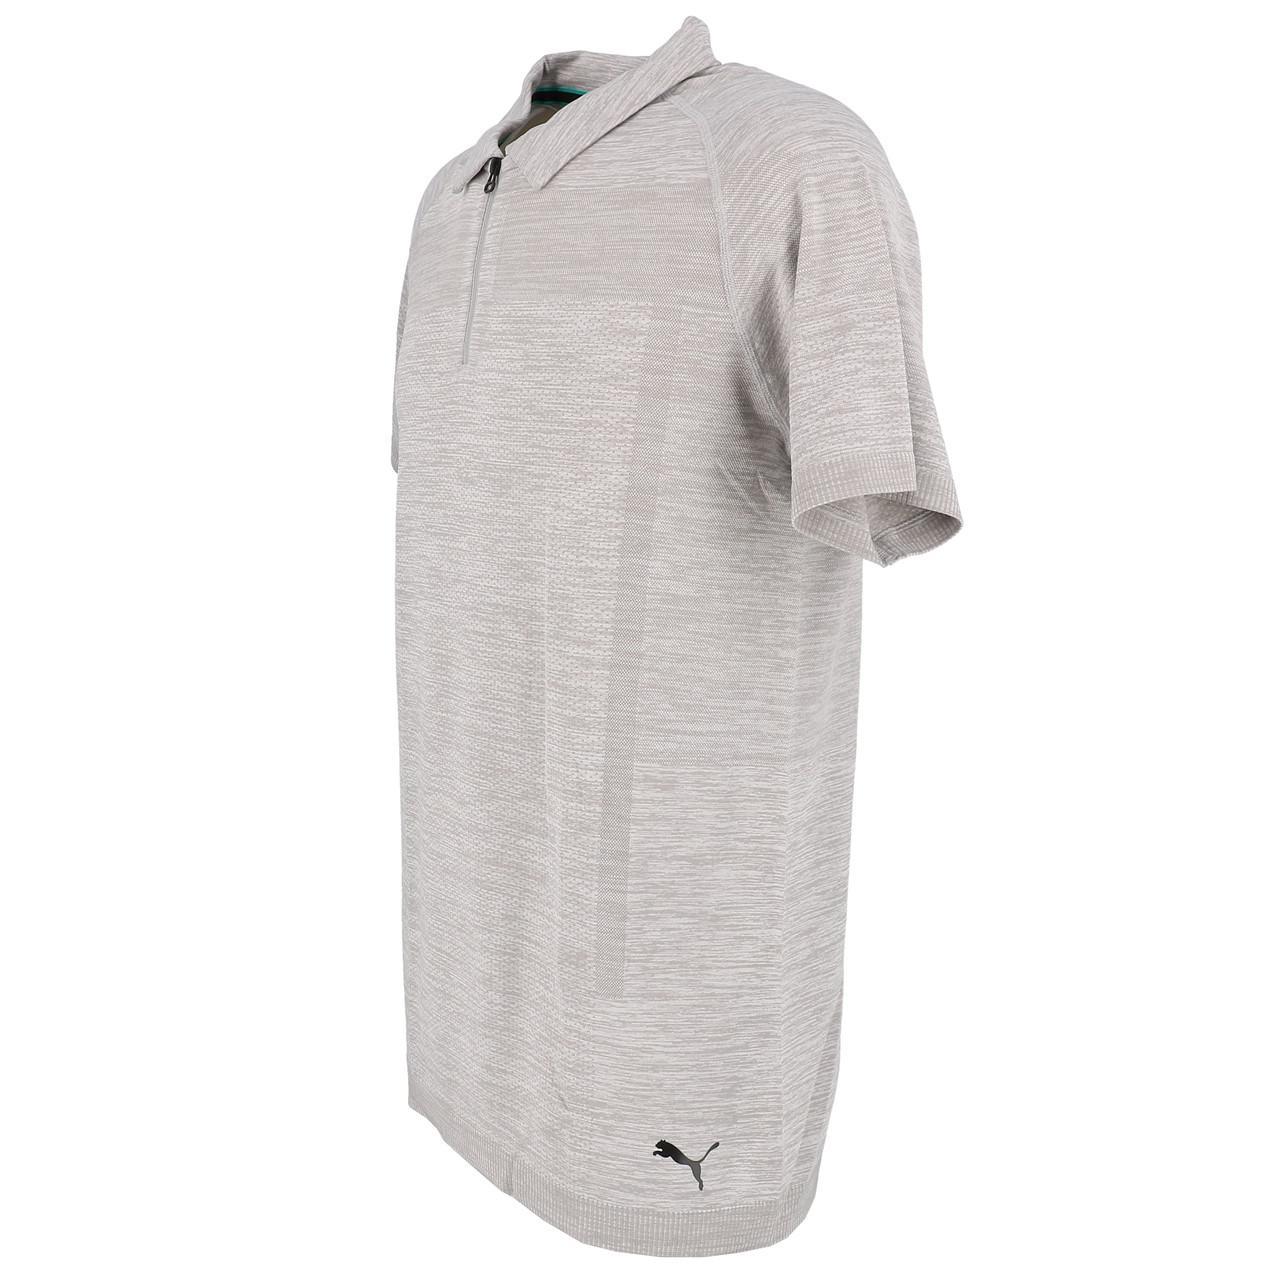 Short-Sleeve-Polo-Puma-Mapm-Rct-Evoknit-Groups-Polo-Grey-30141-New thumbnail 4